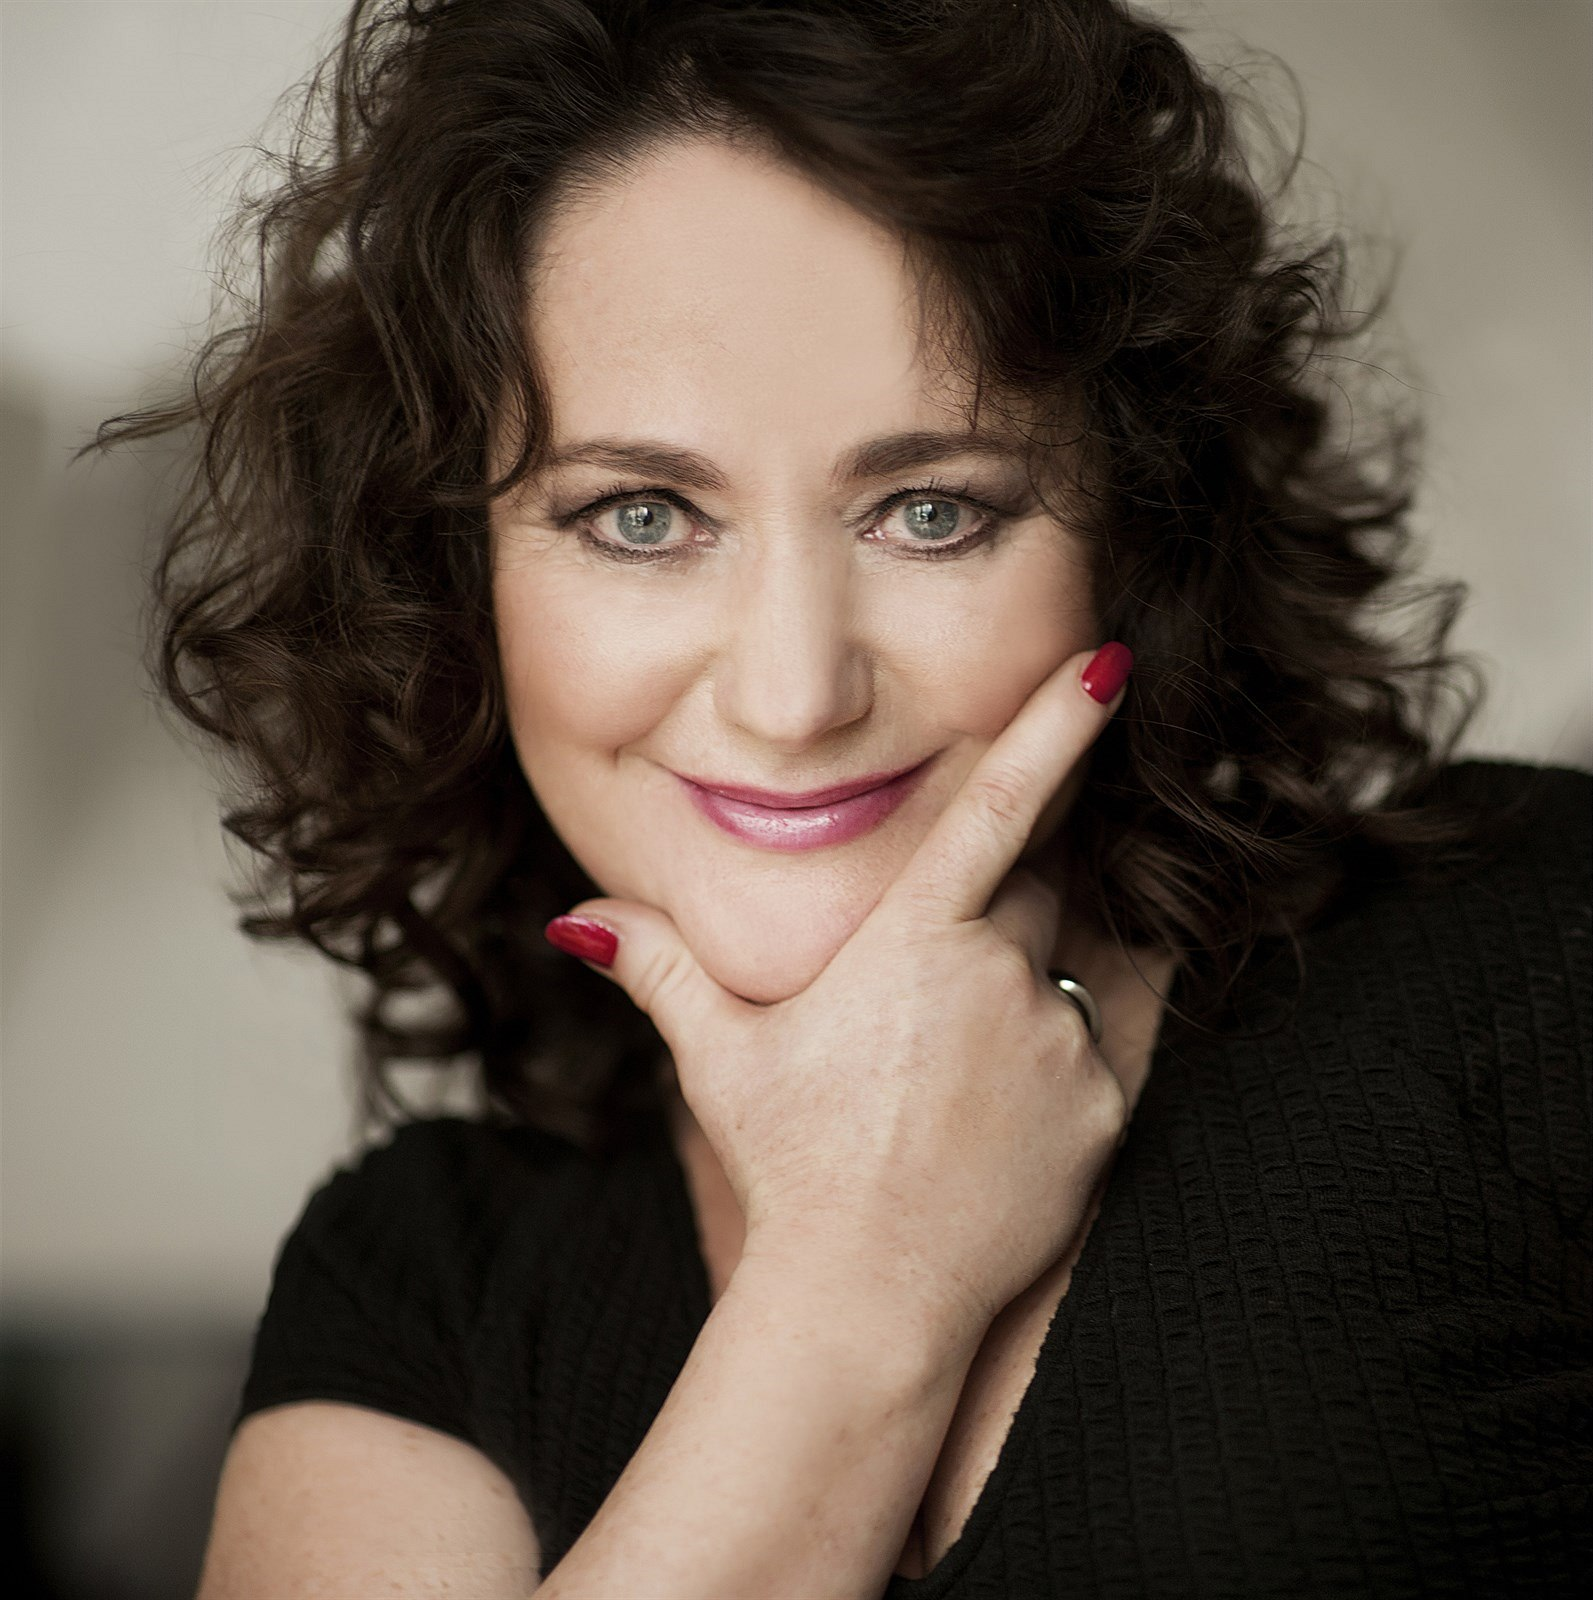 Miriam Chytilova